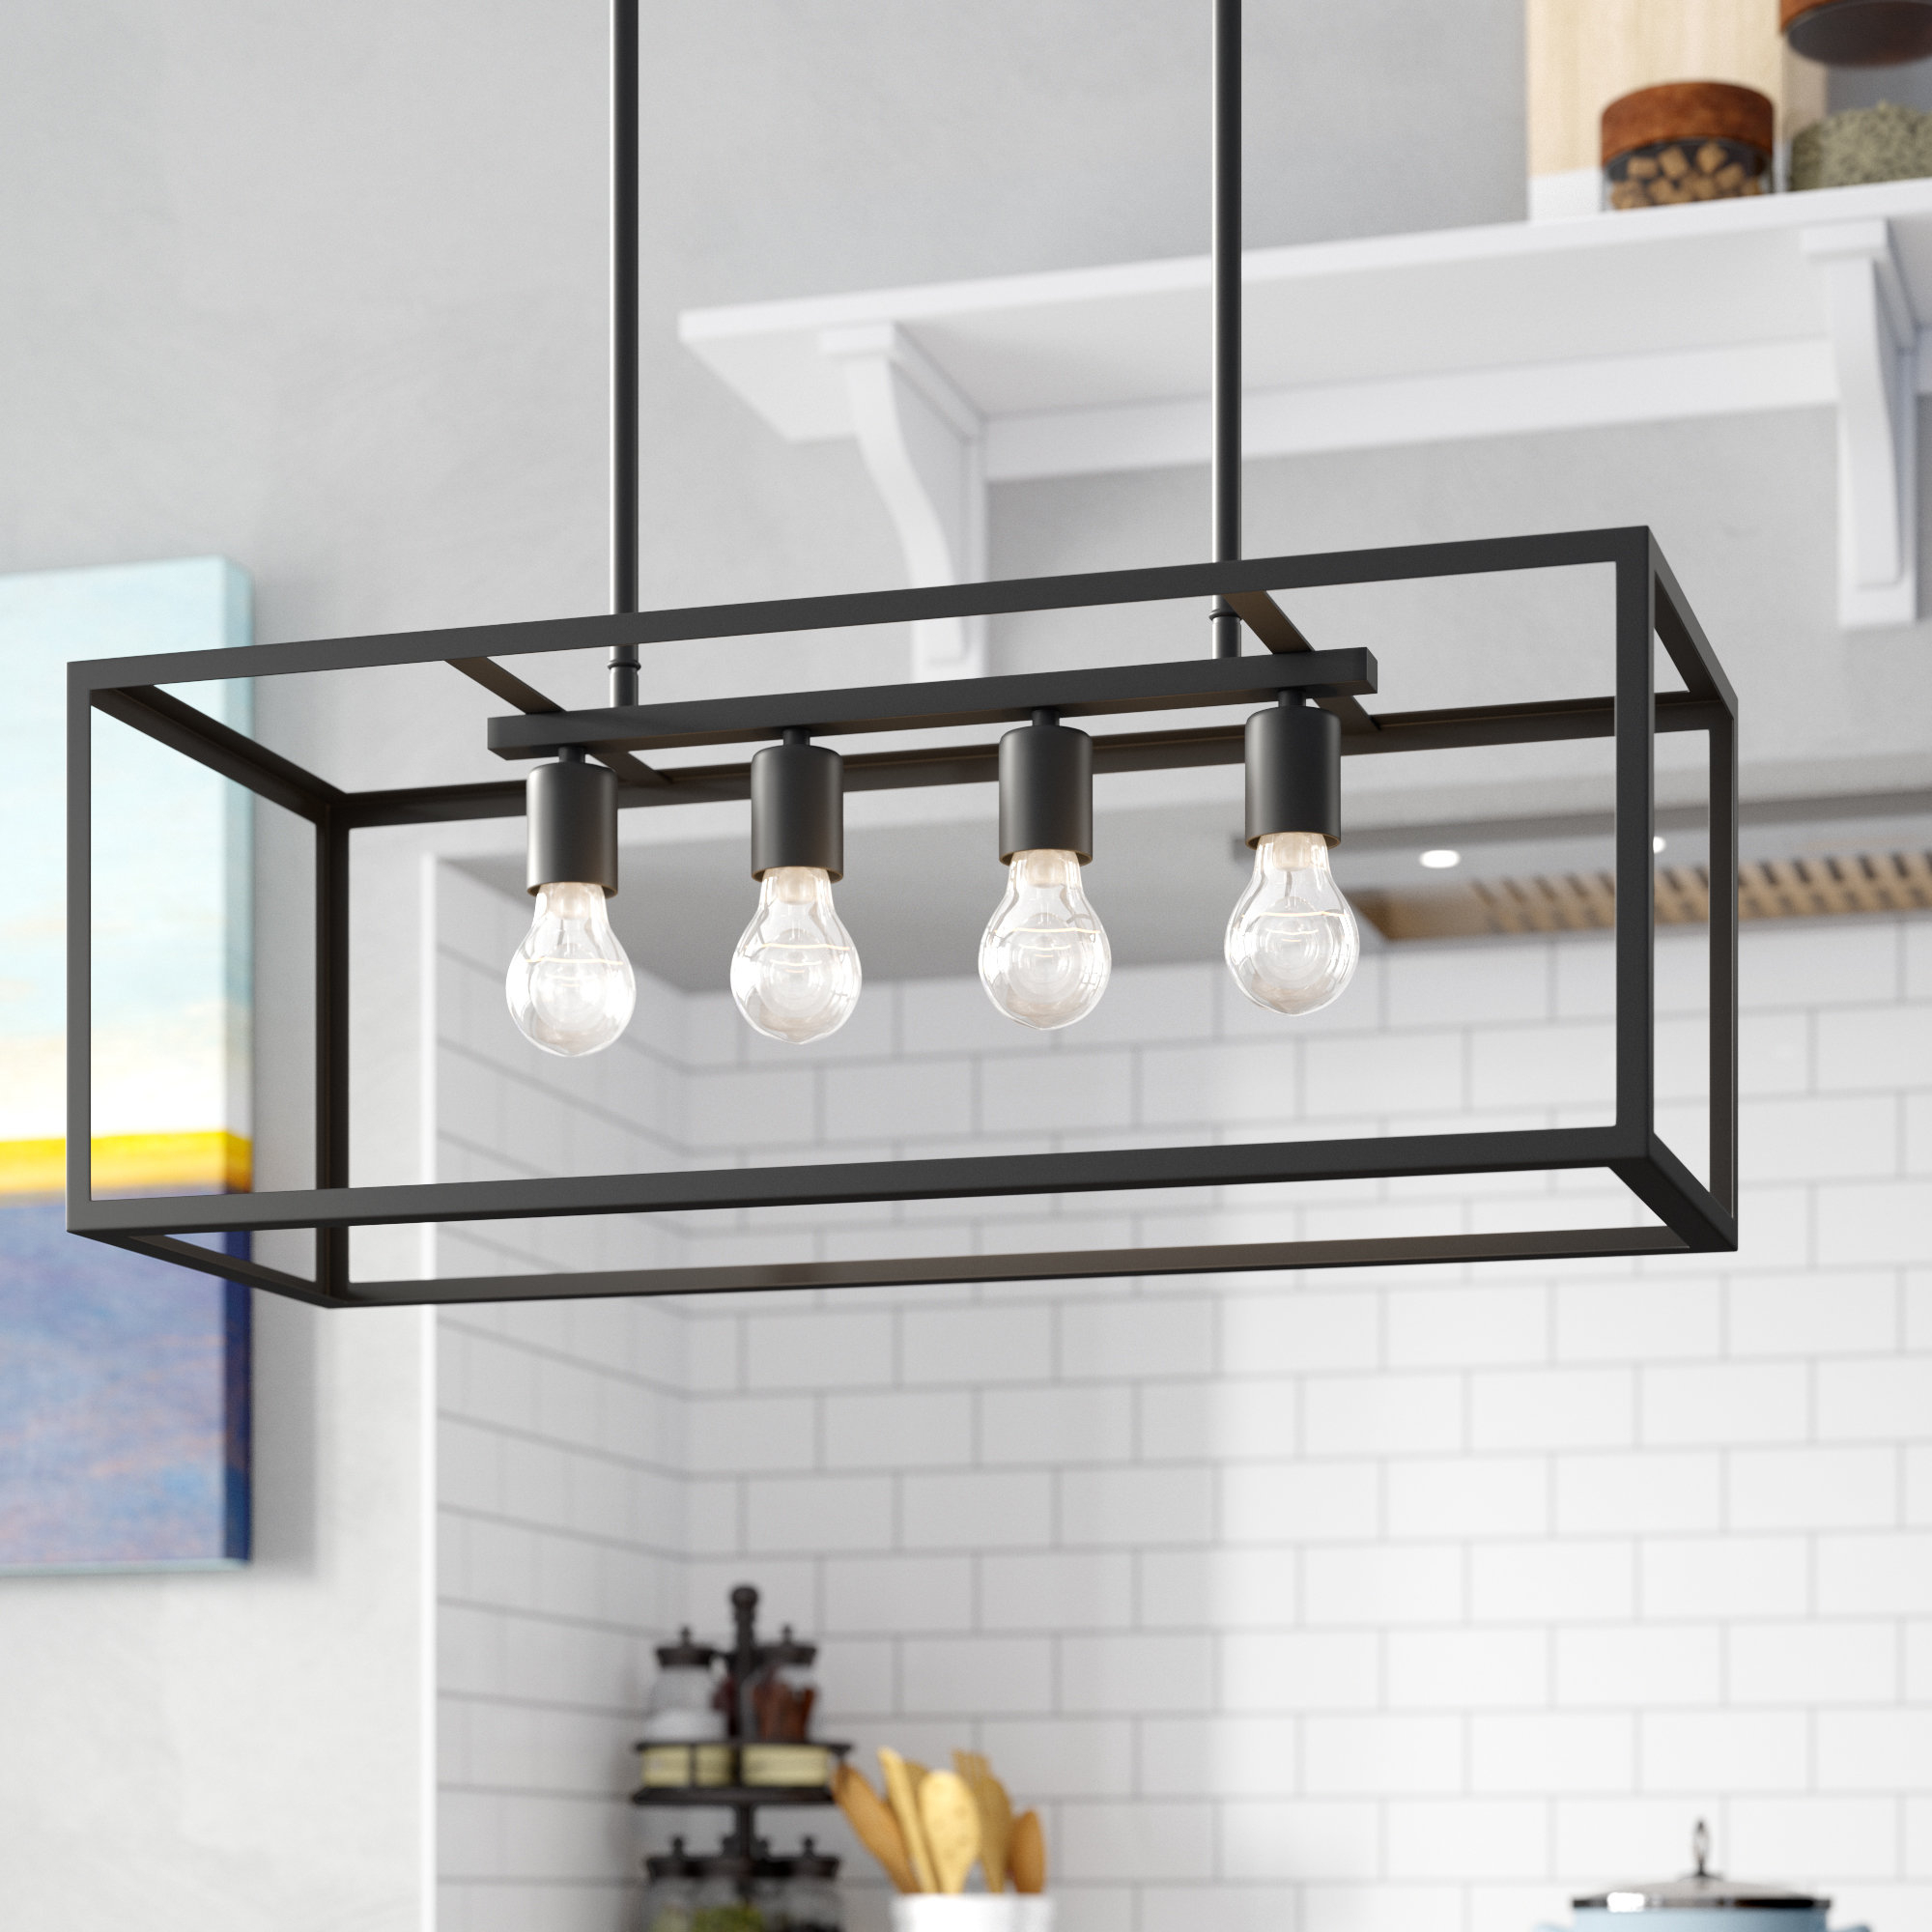 Jefferson 4 Light Kitchen Island Linear Pendants Regarding 2019 Ratner 4 Light Kitchen Island Linear Pendant (View 8 of 20)